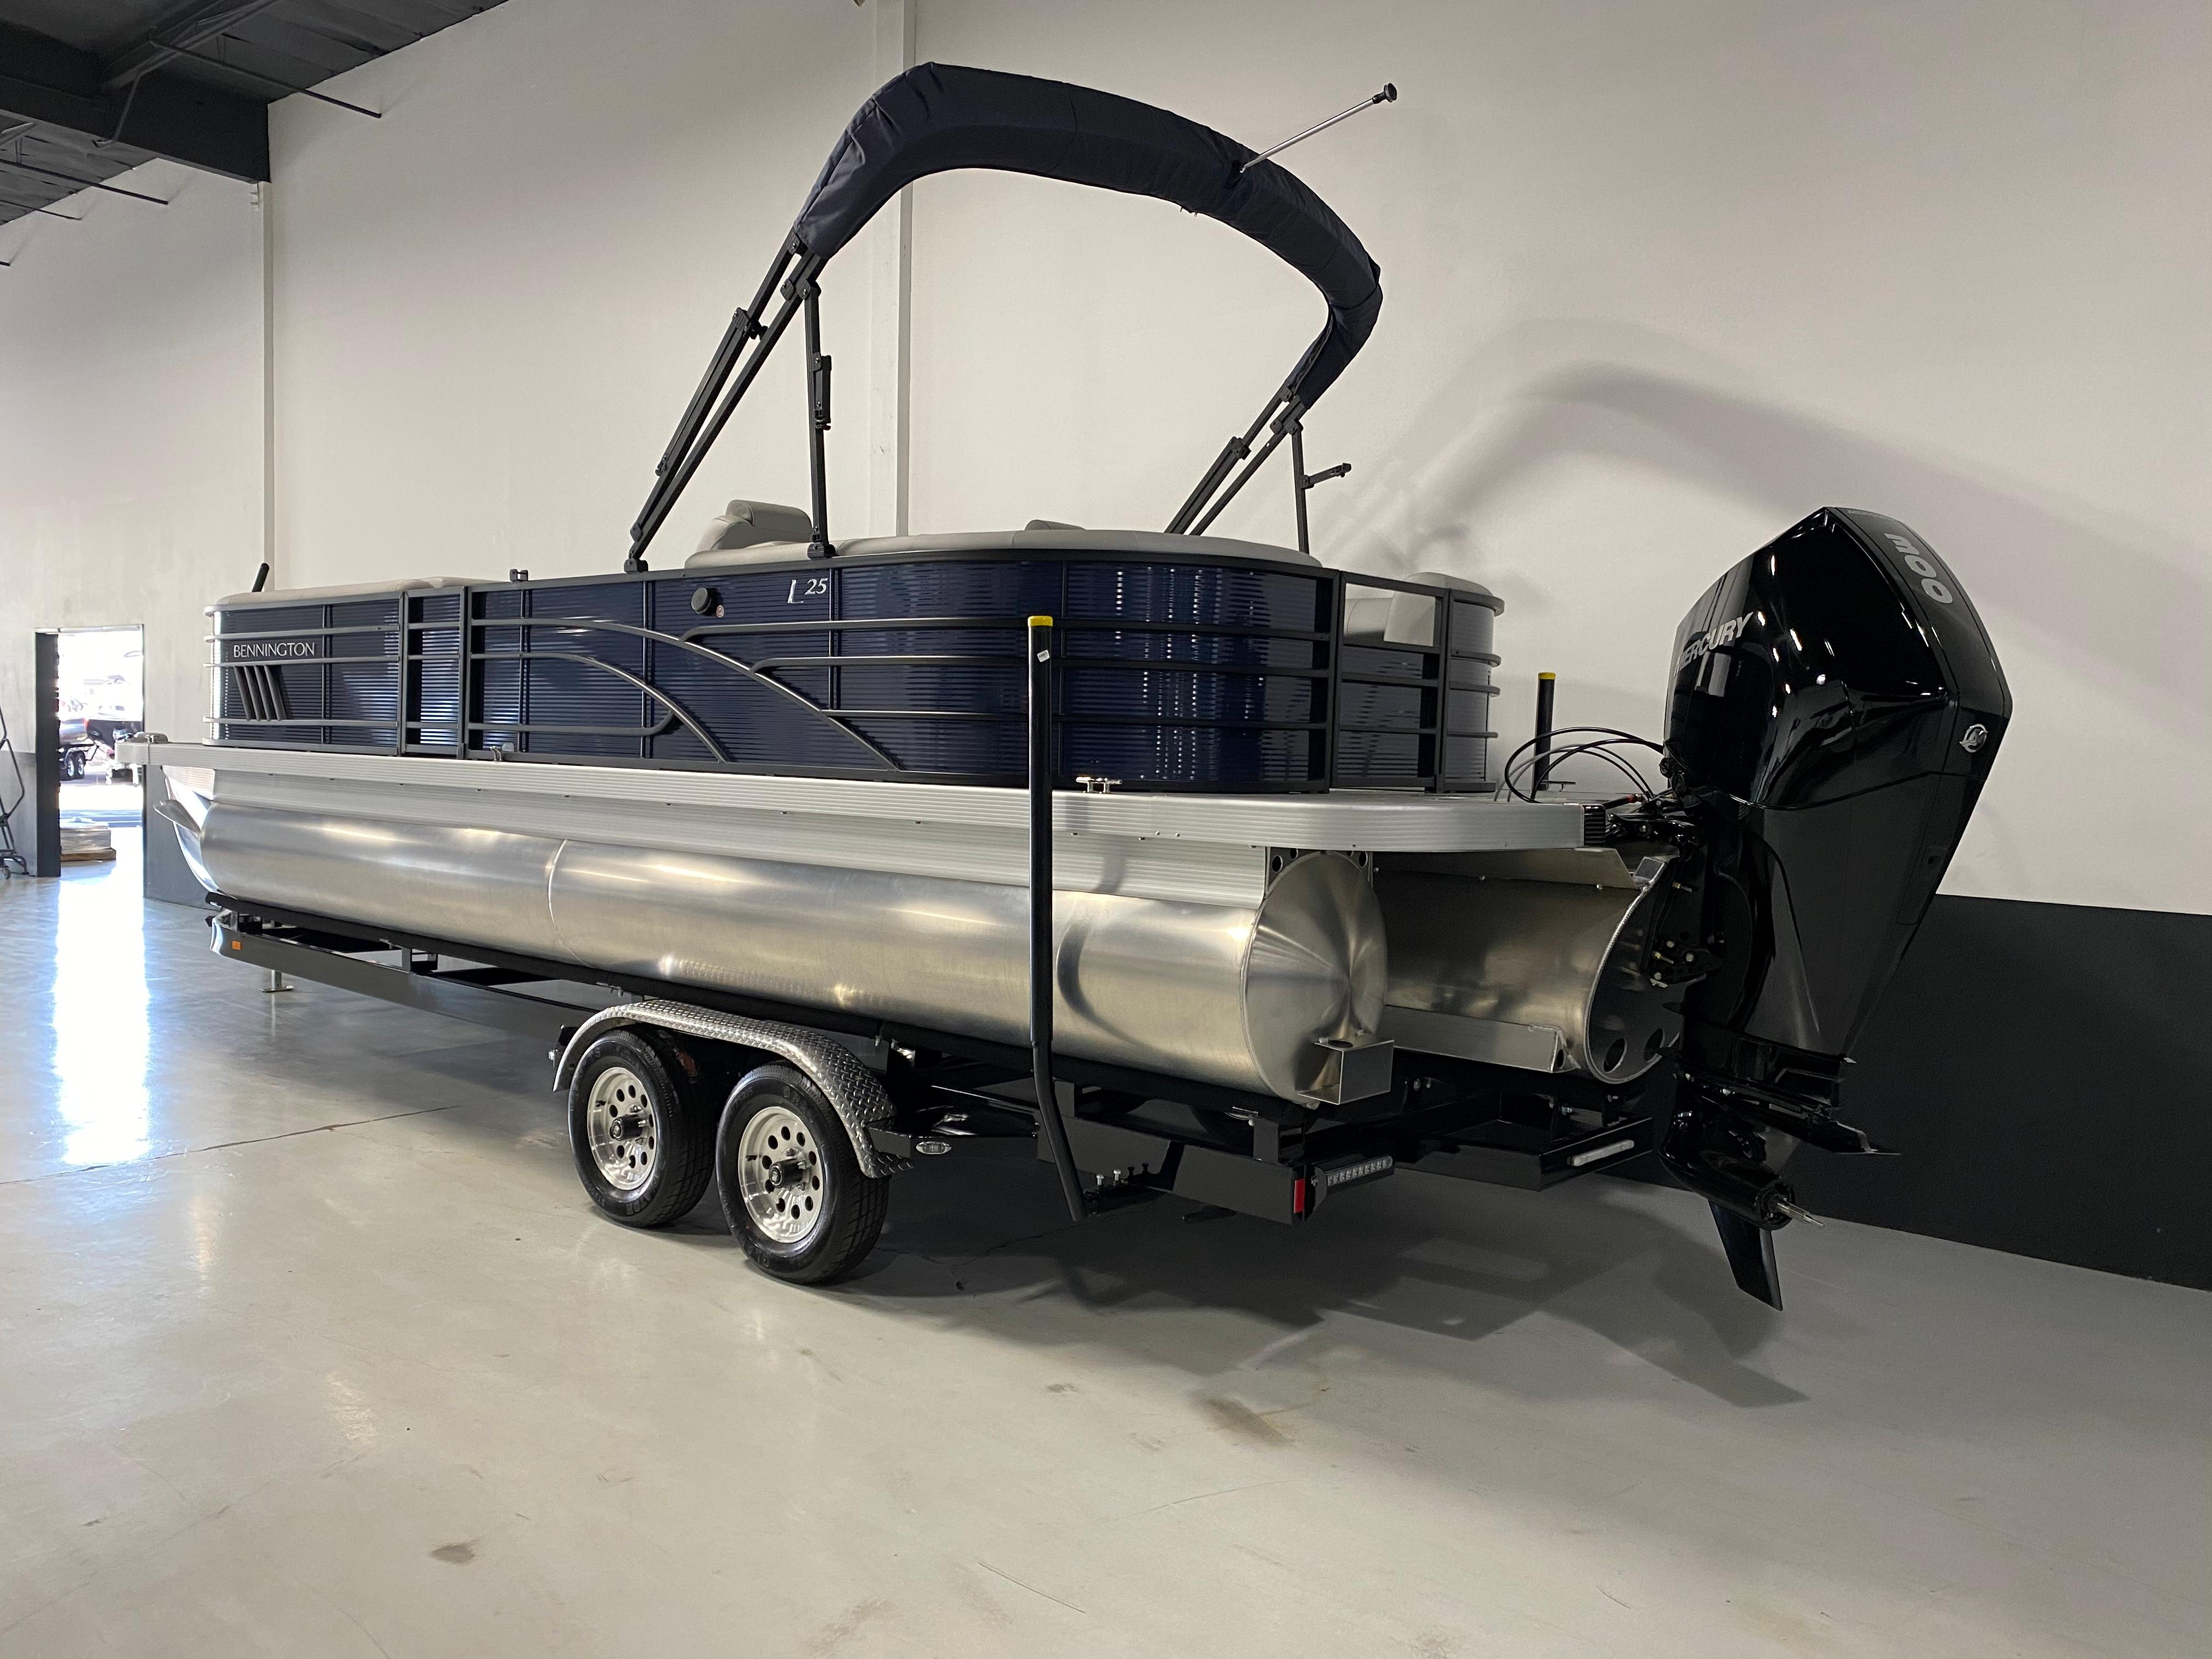 2021 Bennington 25 LSR #B9348H inventory image at Sun Country Inland in Lake Havasu City